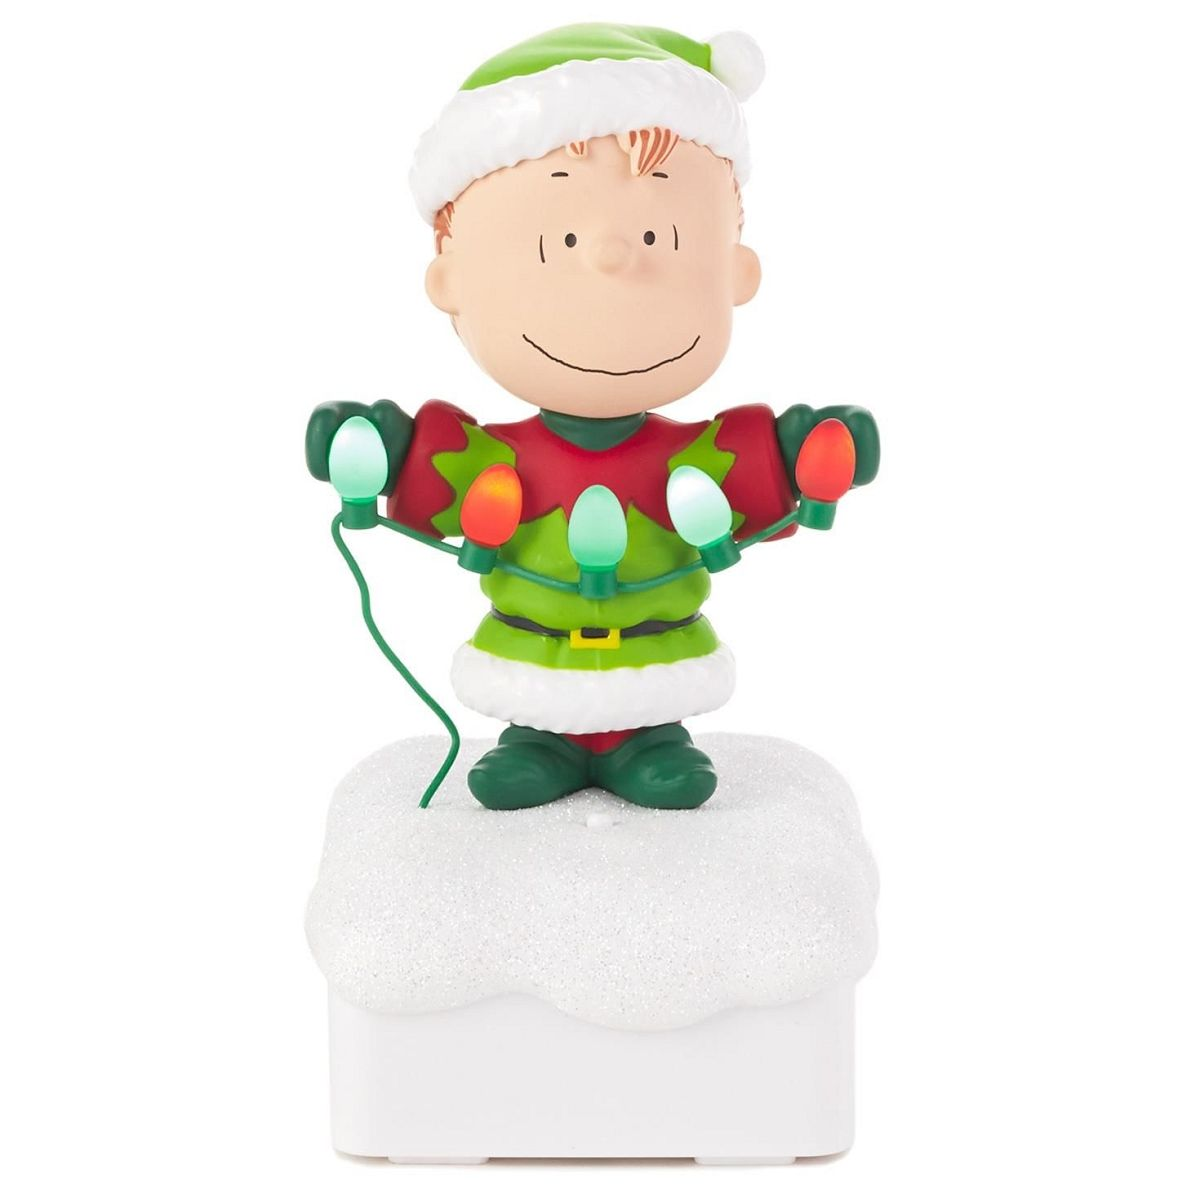 2015 Peanuts Gang Christmas Light Show - Linus | Peanuts gang ...